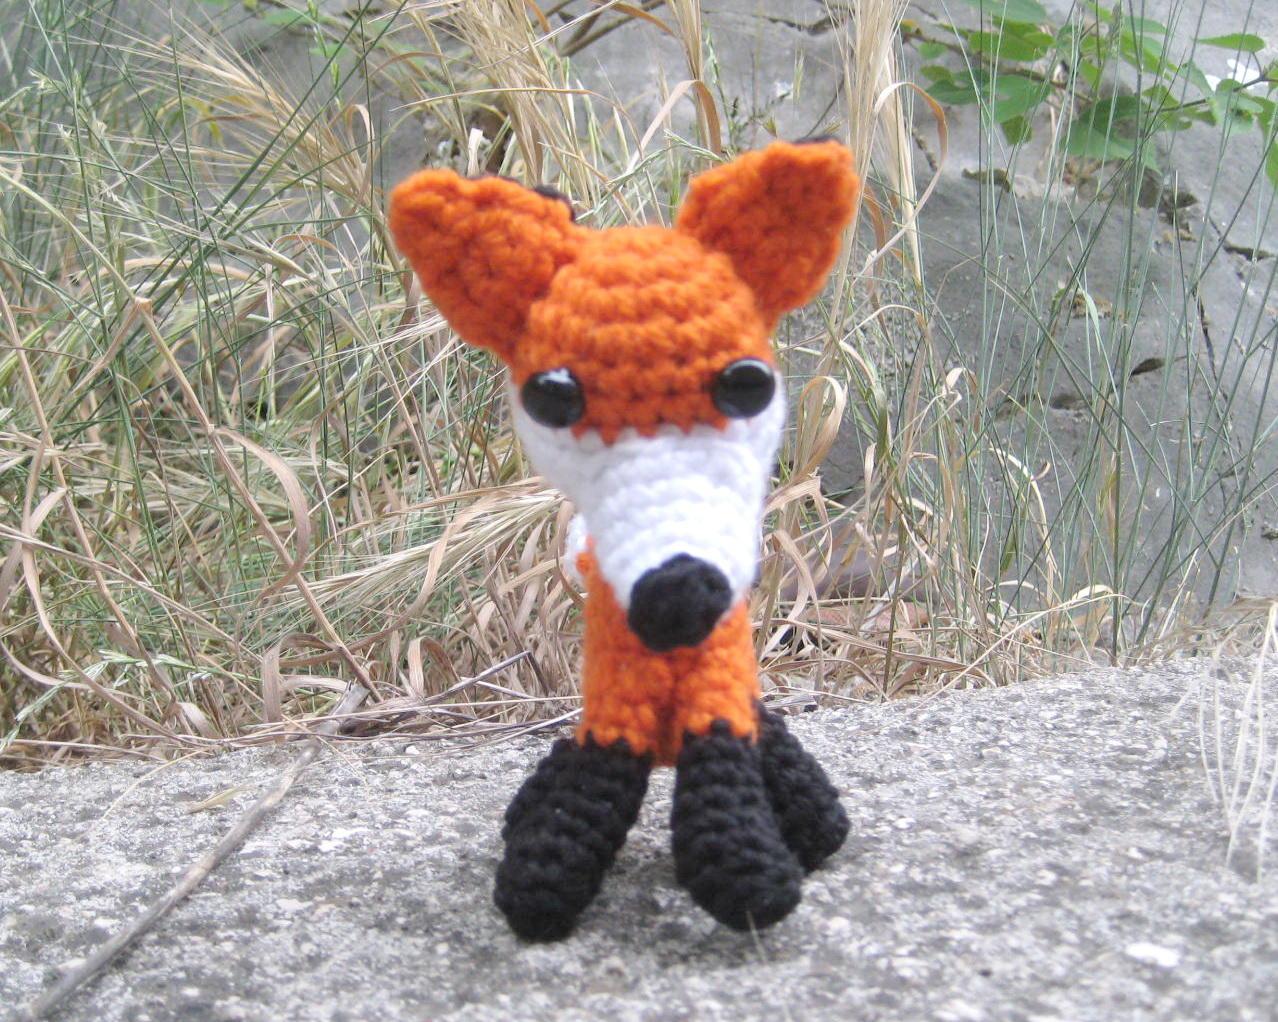 Meet tiny deer - last minute Christmas... - Amigurumi Today - Free amigurumi  patterns | Facebook | 1022x1278